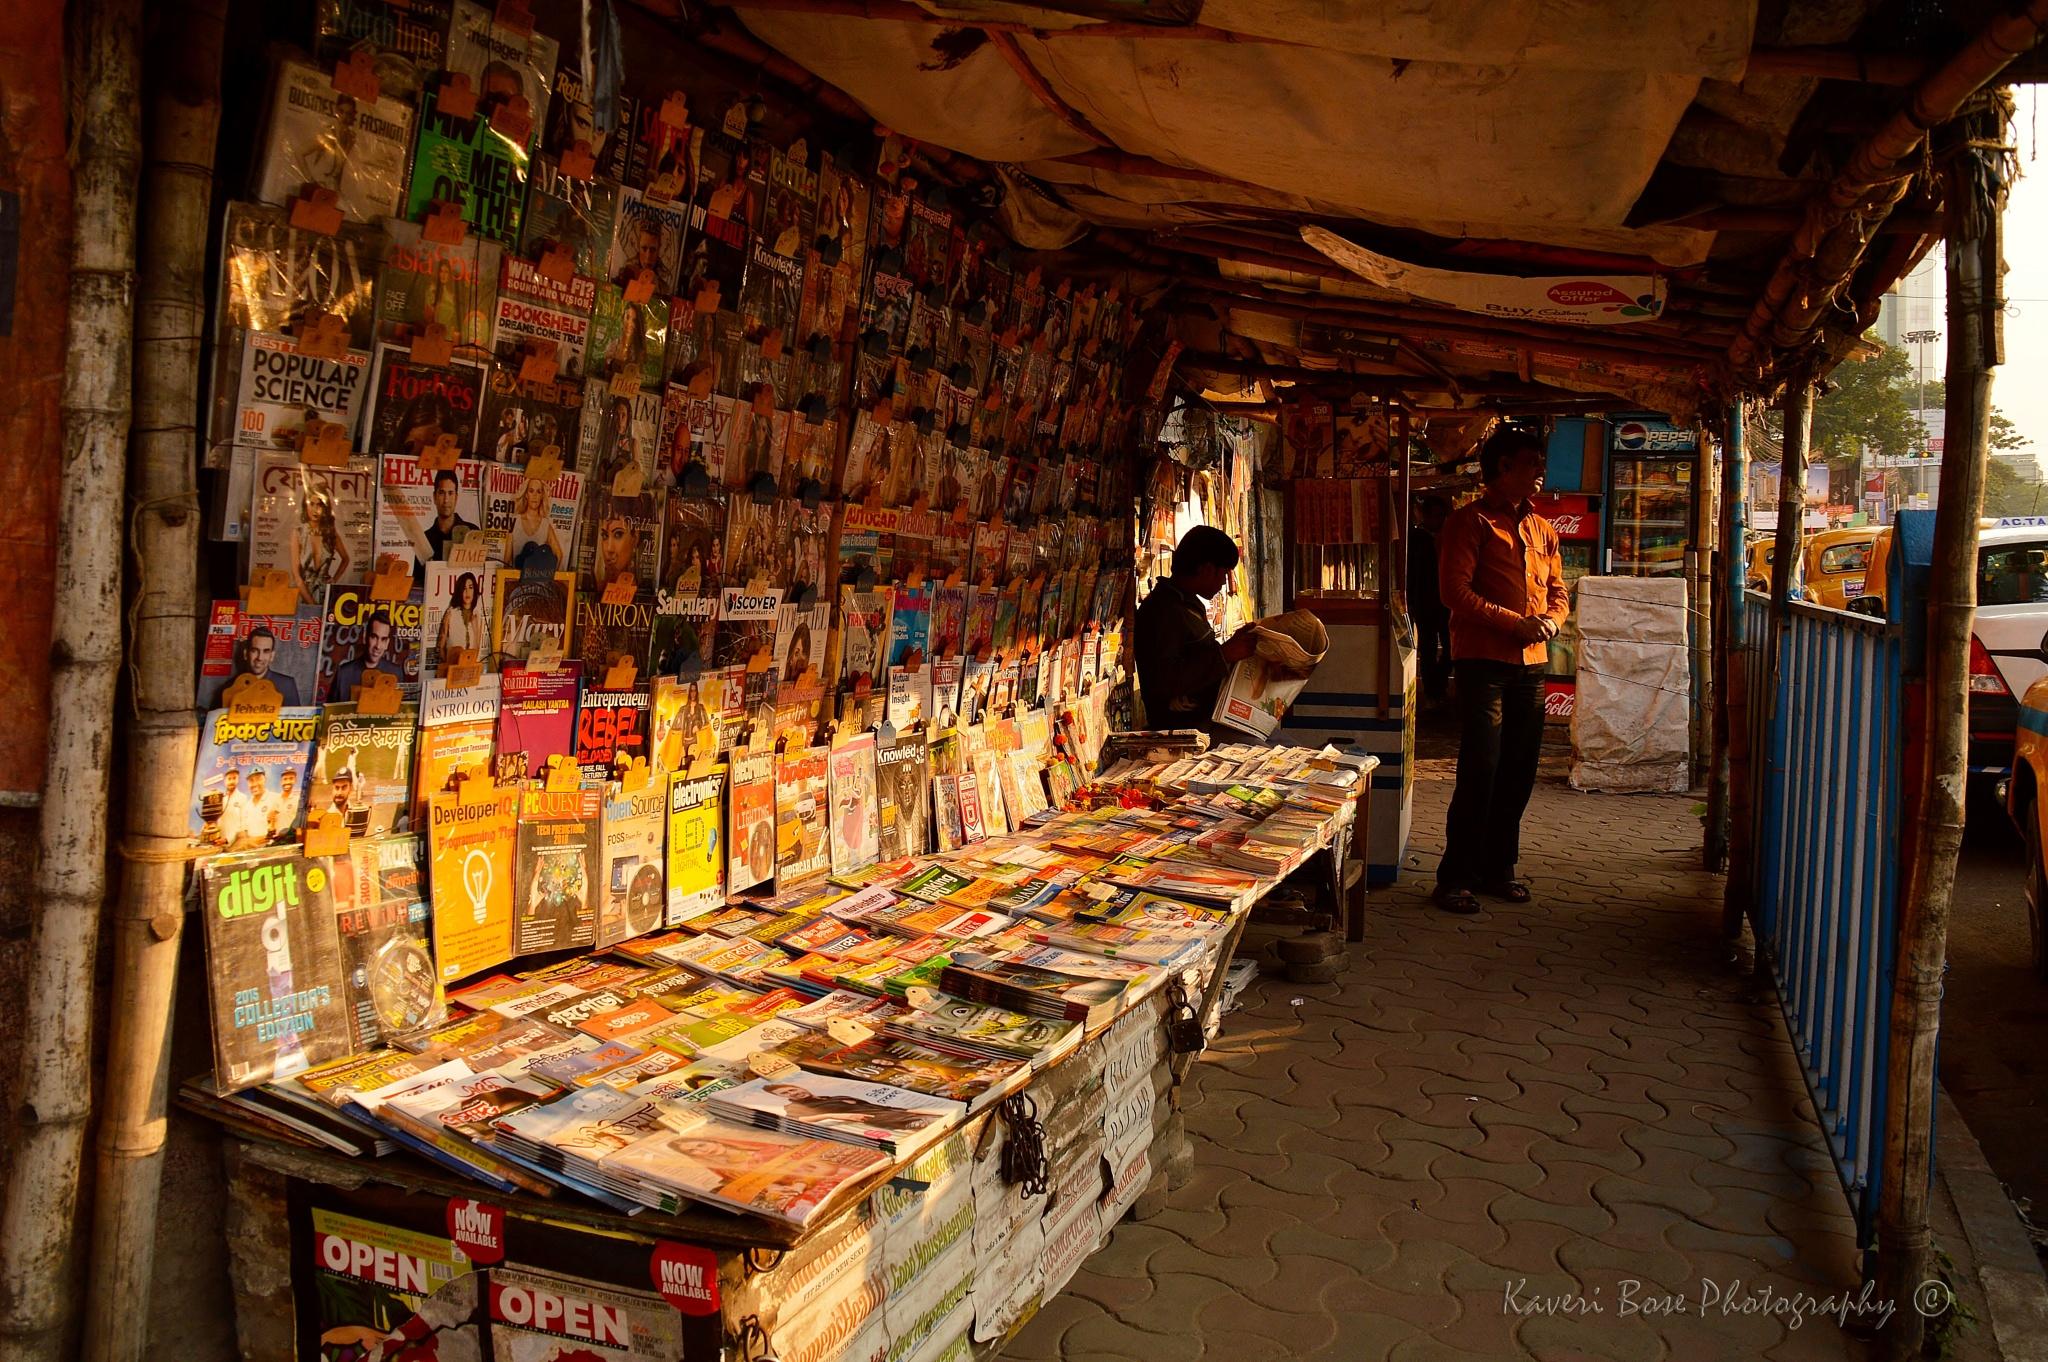 Colorful News by Kaveri Bose